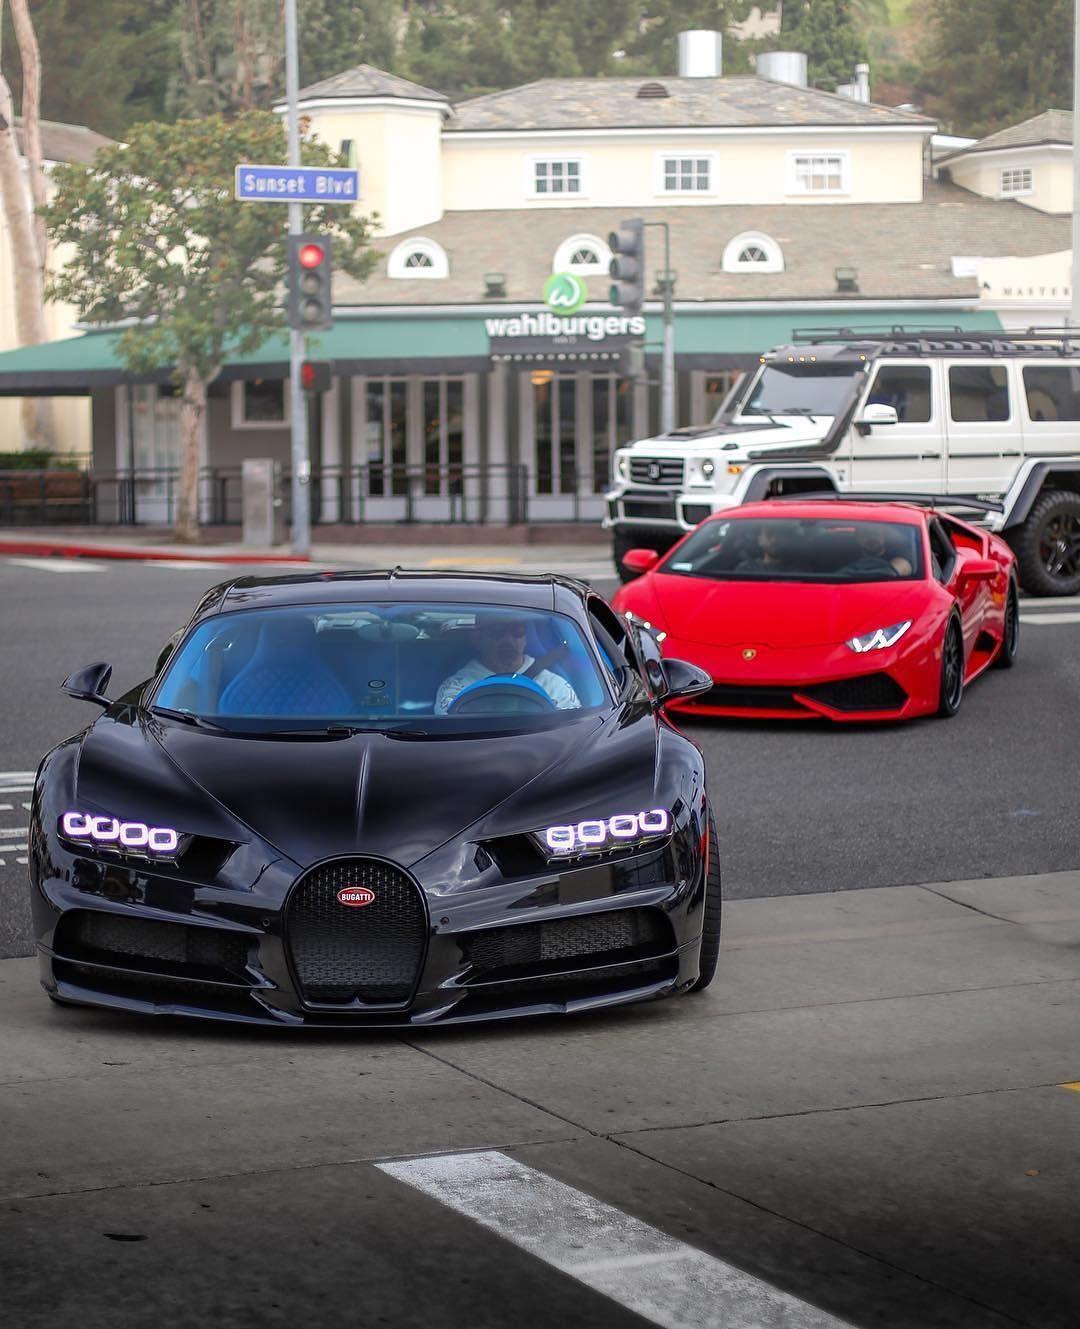 �zel L�ks Arabalar  #cars #luxurycars #sportcars #conceptcars #motorcycles #trucks